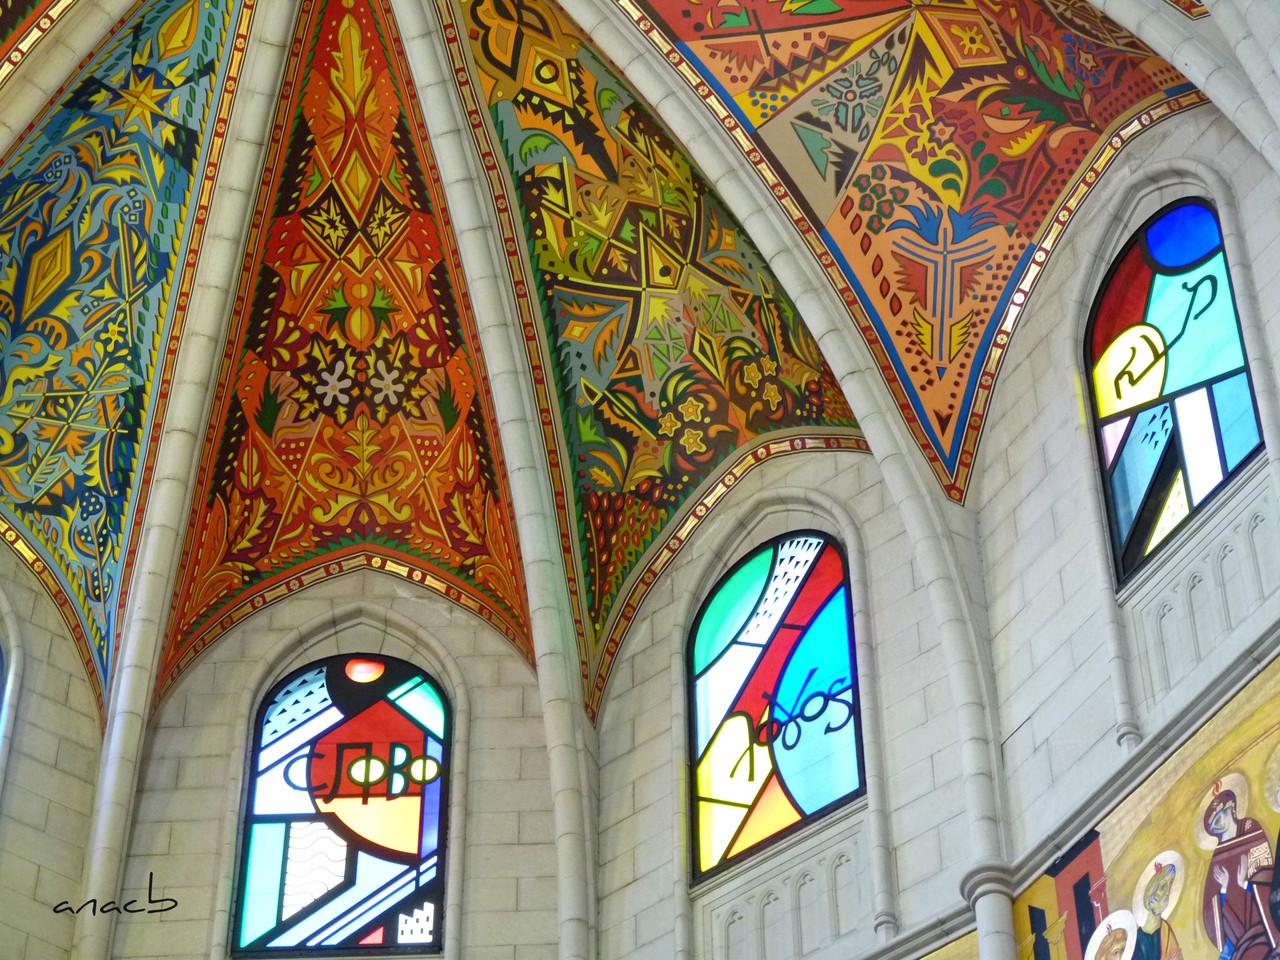 ao acaso #8 Catedral de La Almudena, em Macrid.jpg